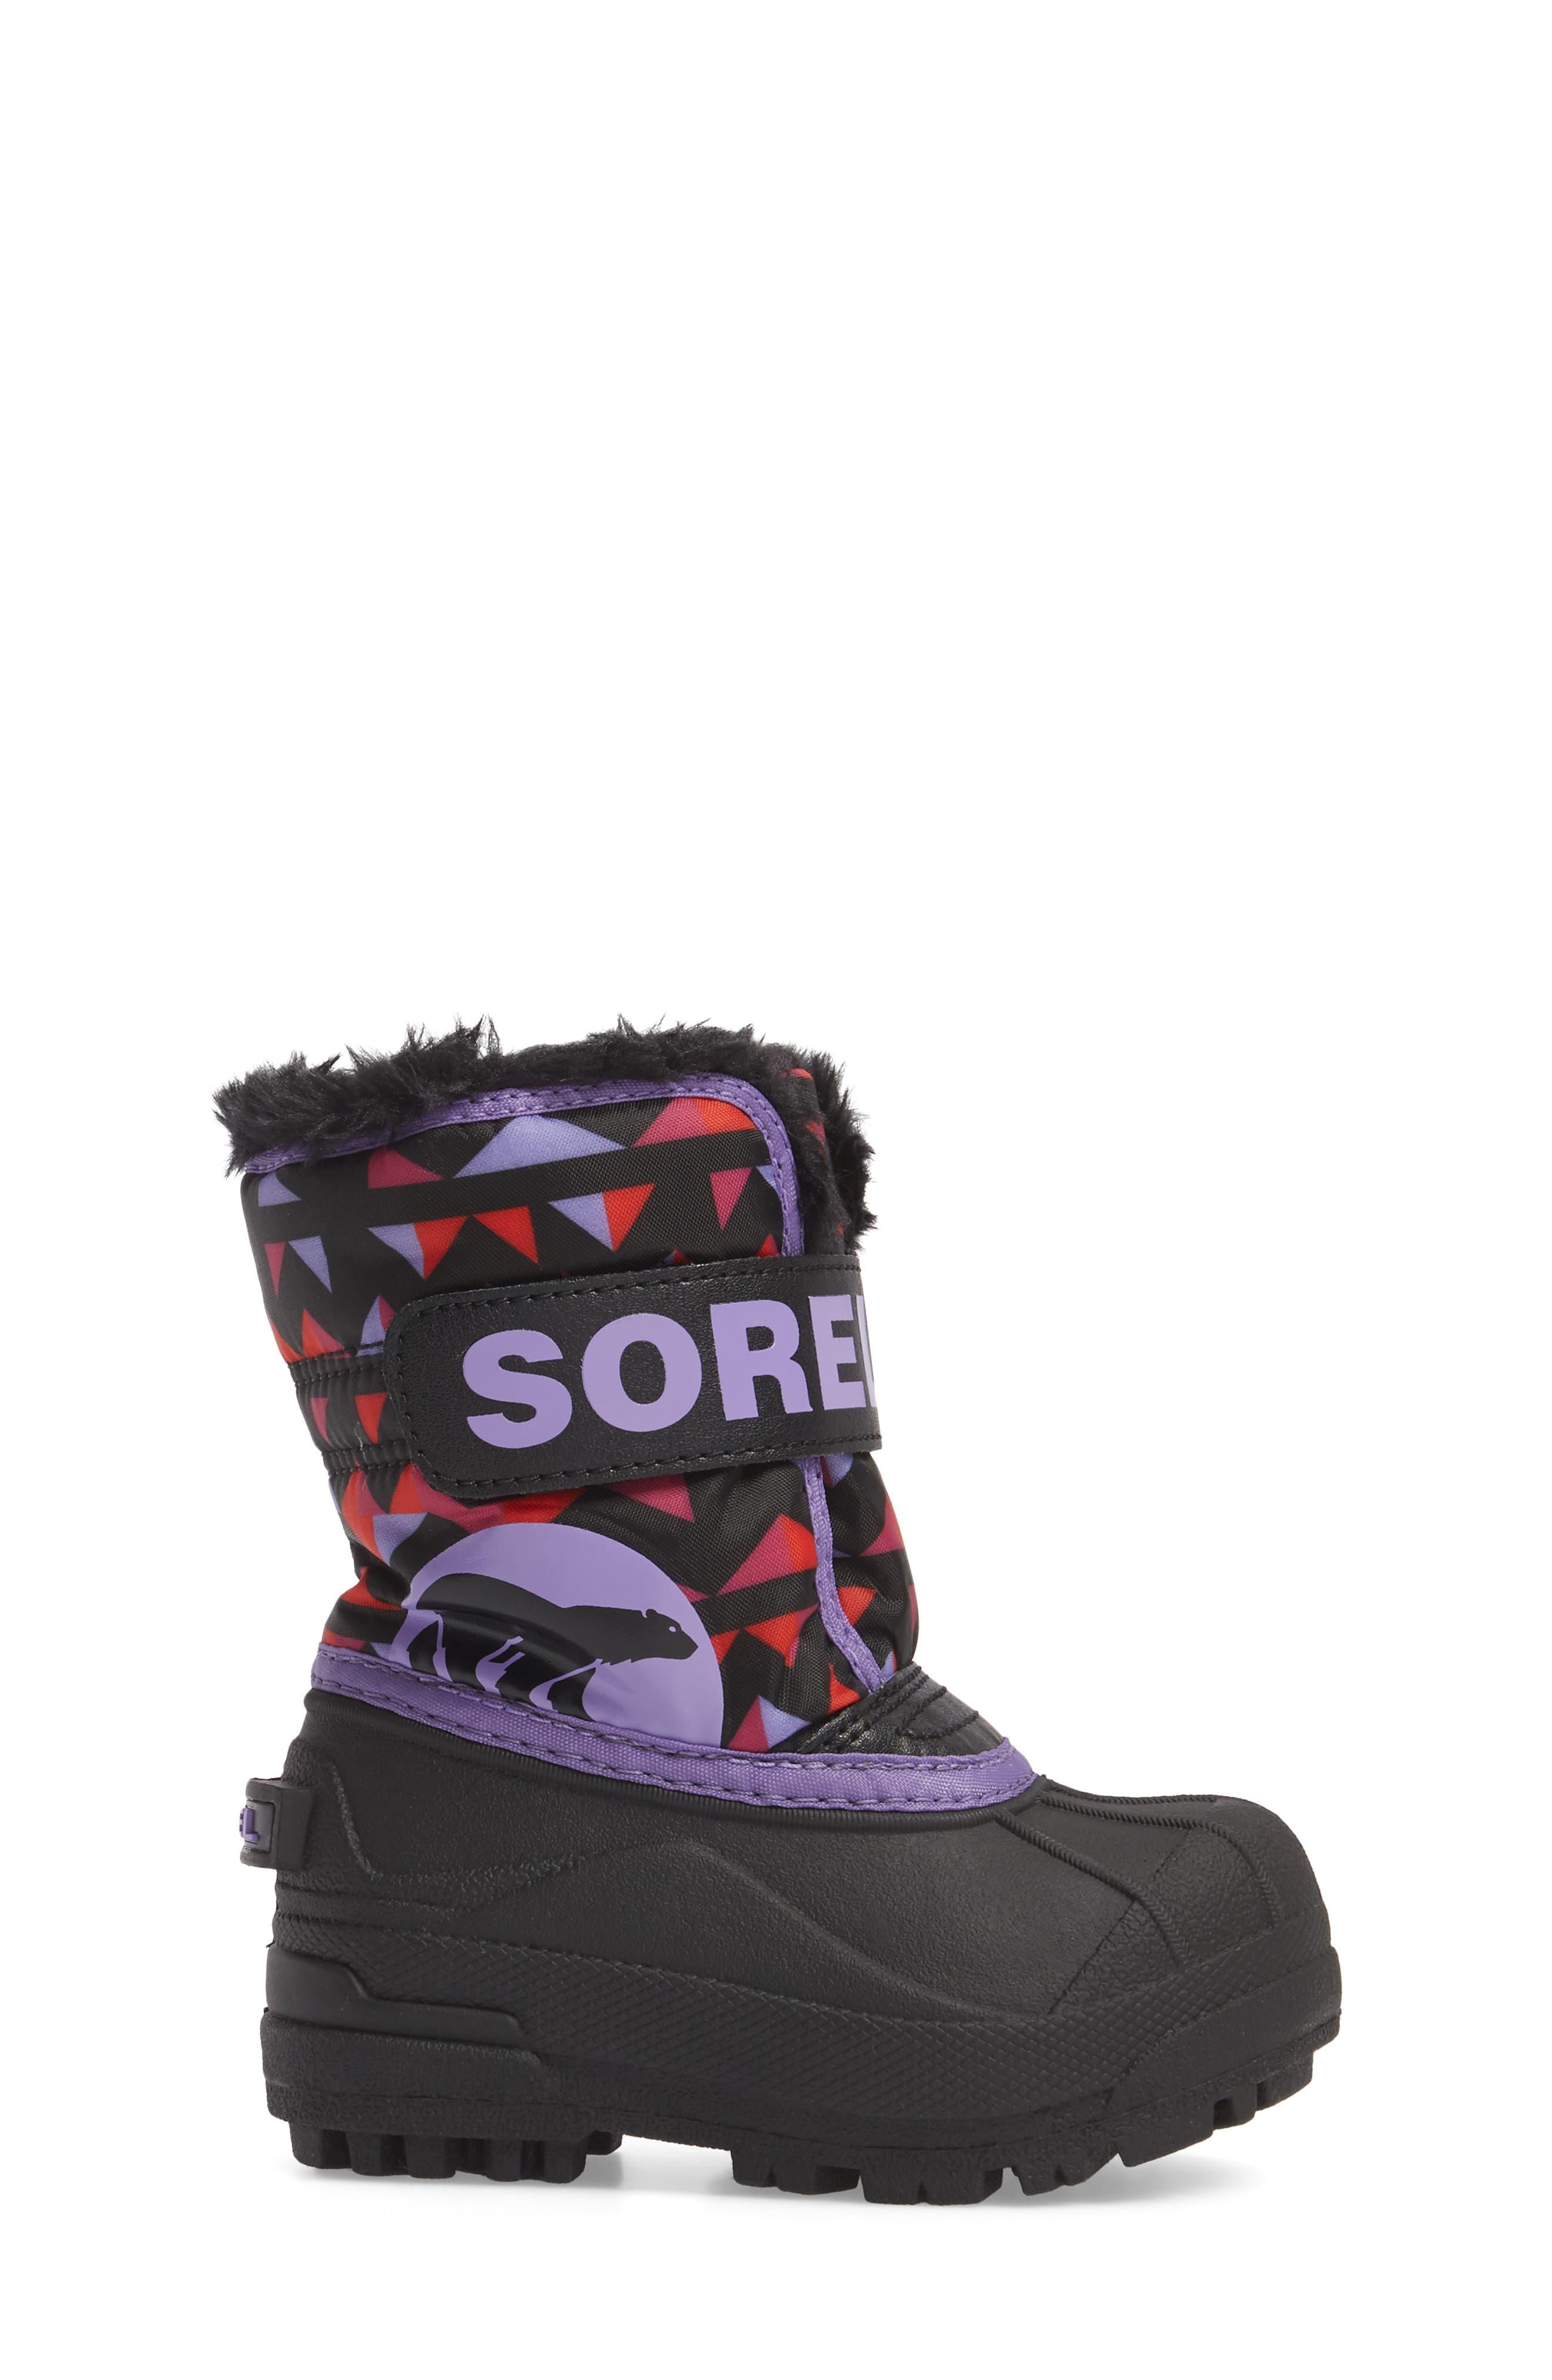 Children's Snow Commander Insulated Waterproof Boot,                             Alternate thumbnail 3, color,                             Black/ Paisley Purple